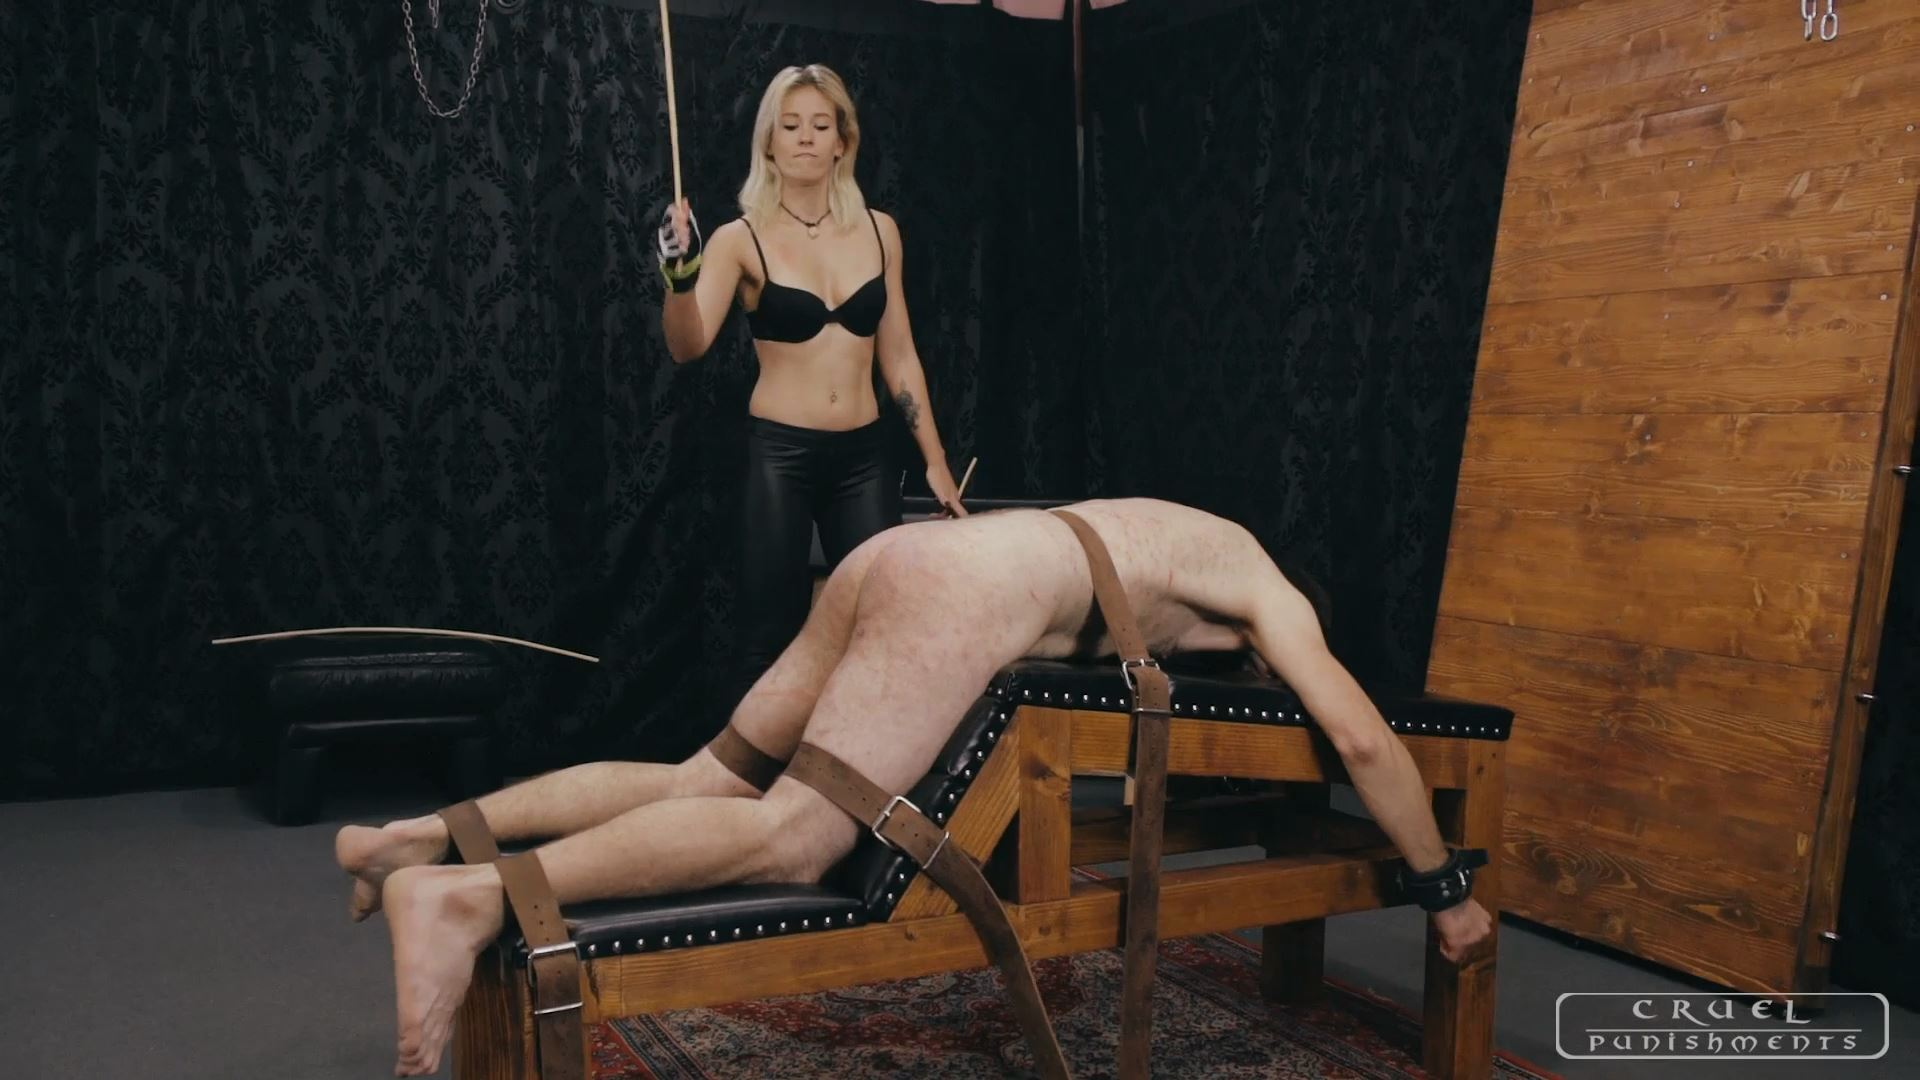 Mistress Anette In Scene: Anette's most brutal punishments Part 3 - CRUEL PUNISHMENTS - SEVERE FEMDOM - FULL HD/1080p/MP4